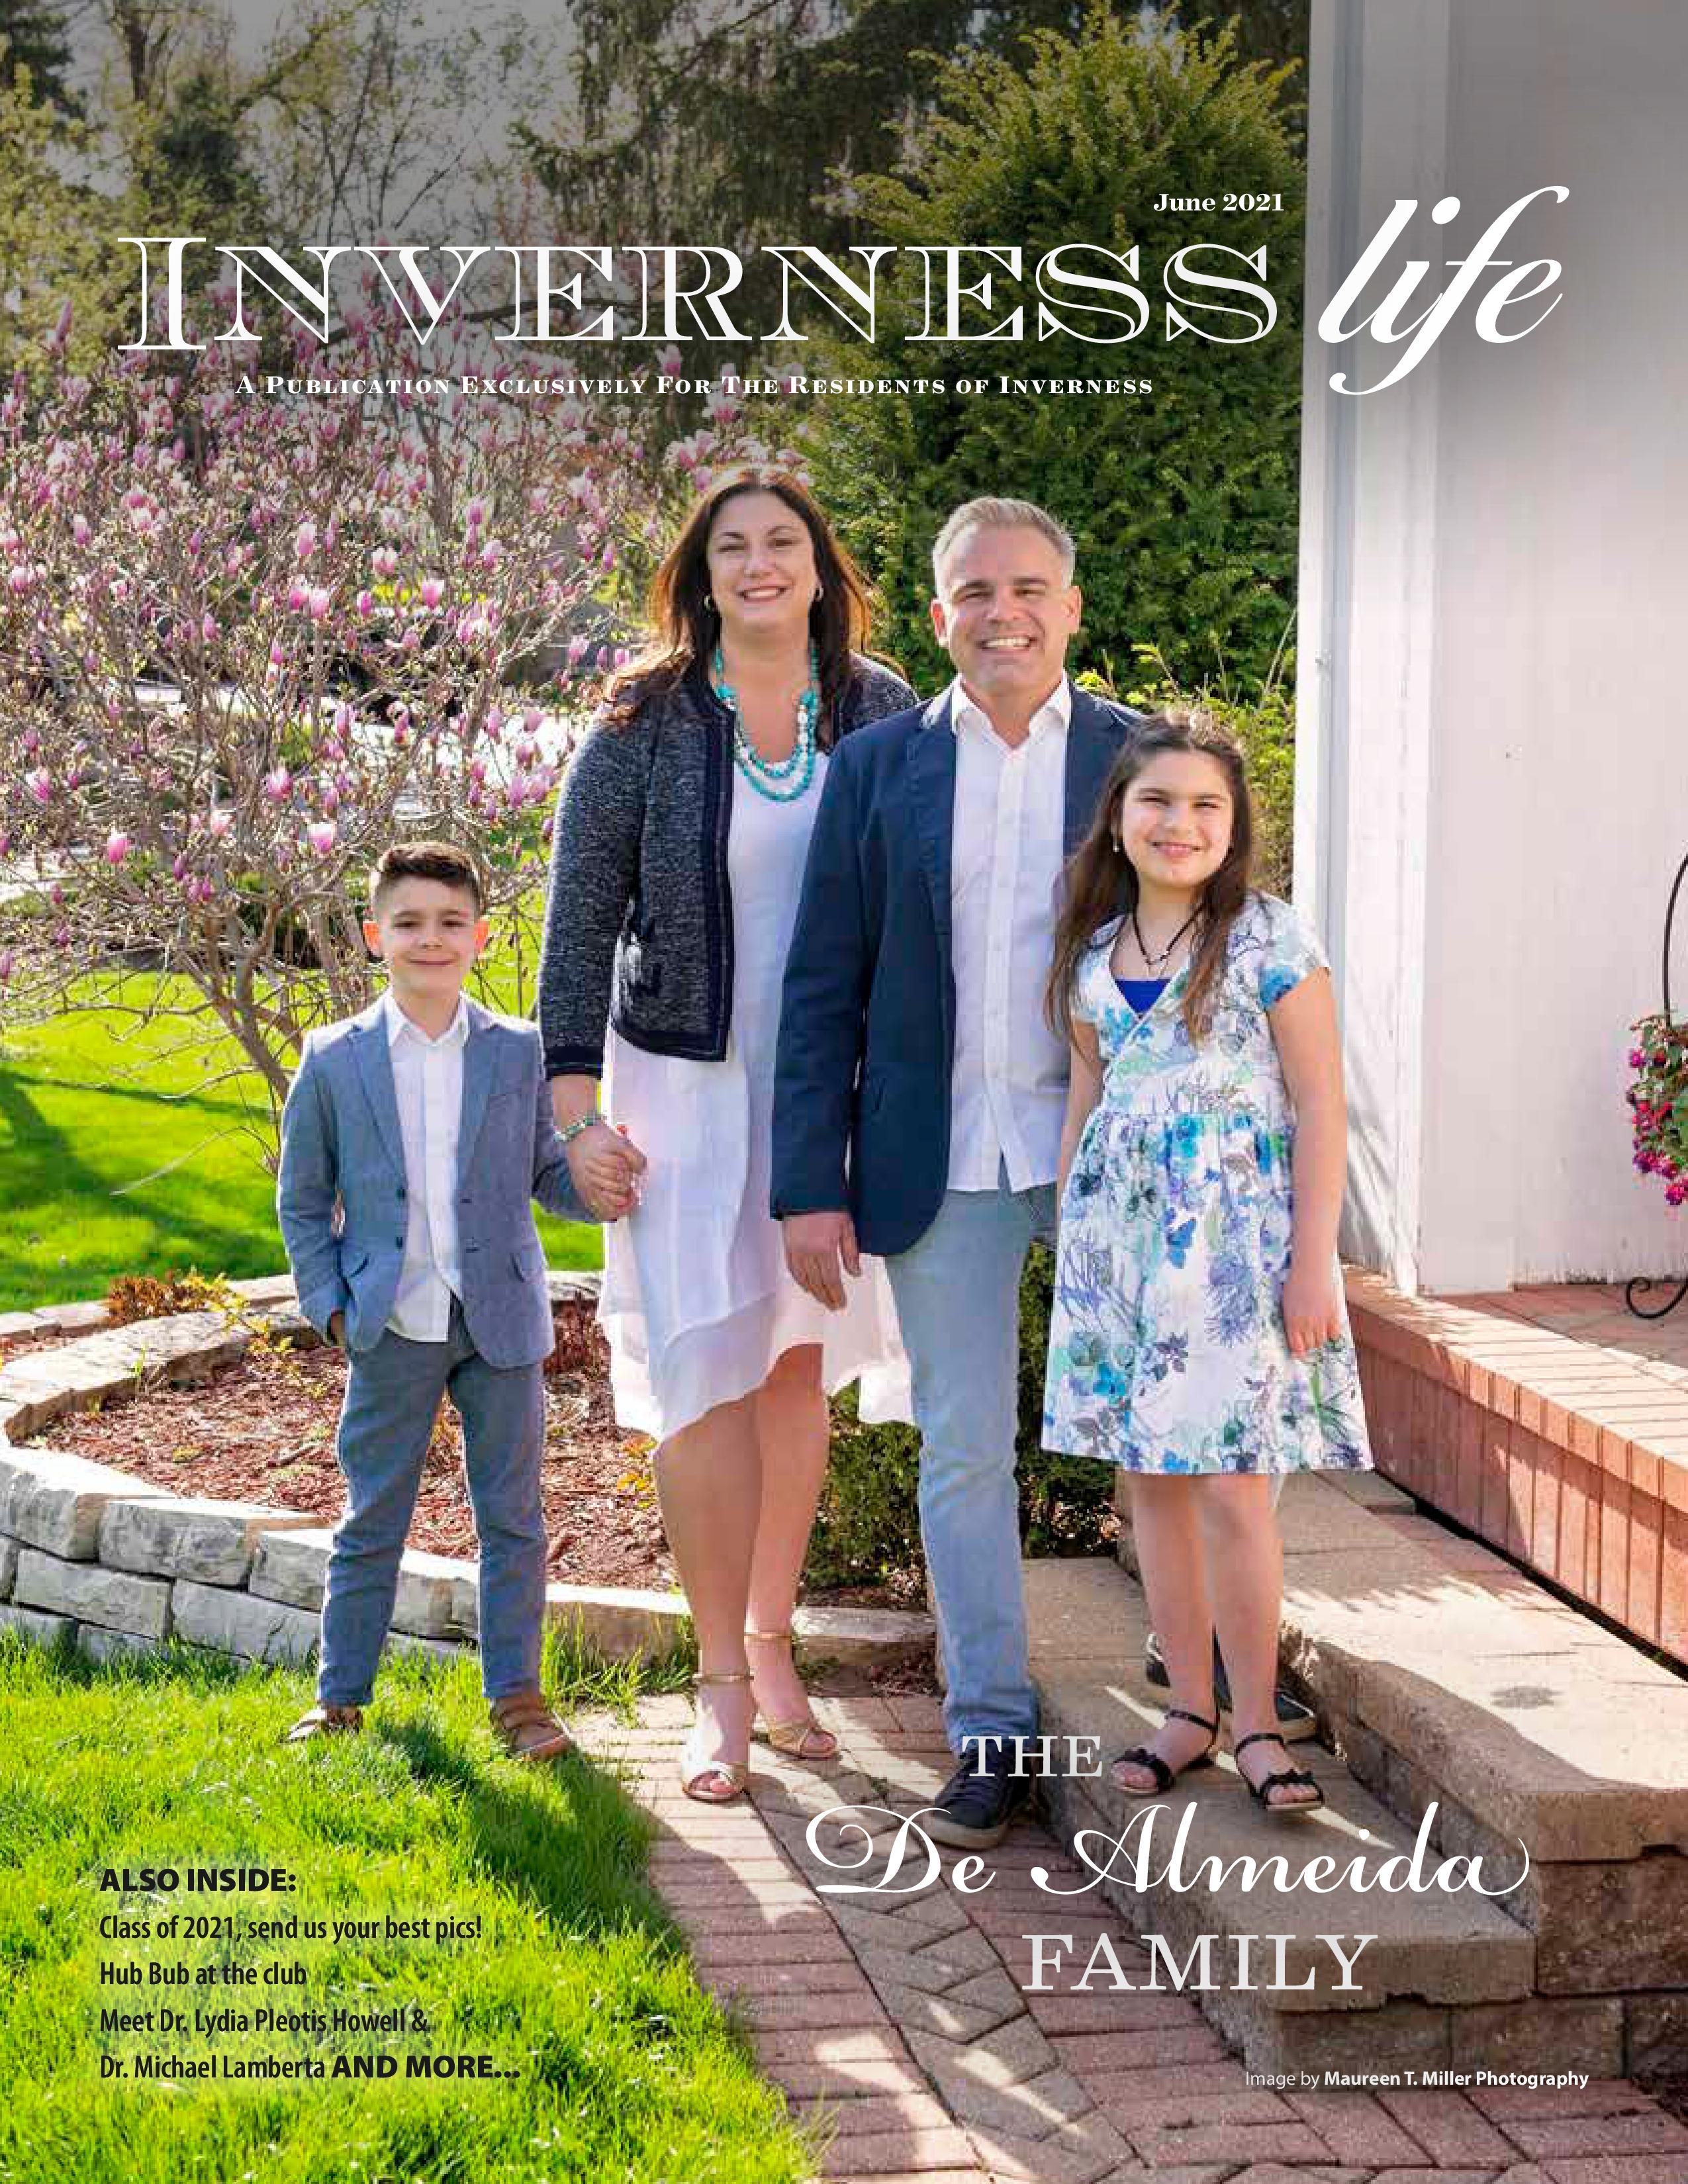 Inverness Life 2021-06-01